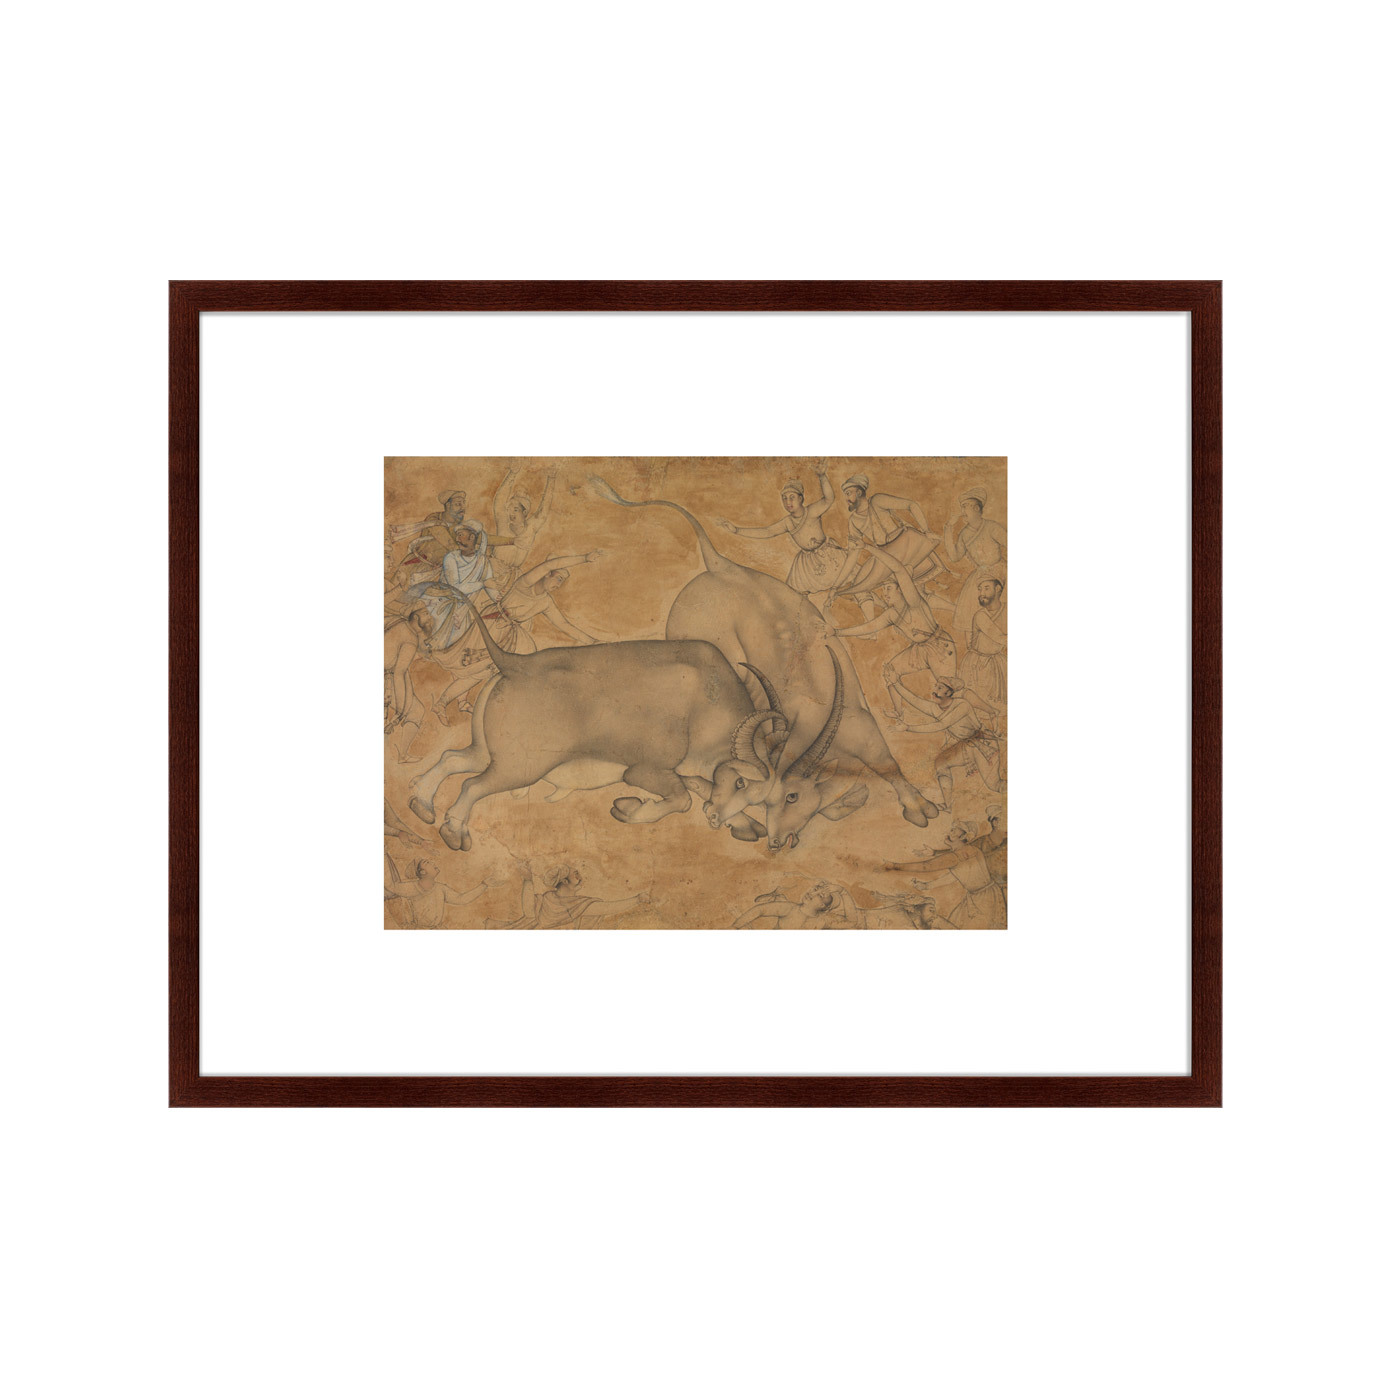 {} Картины в Квартиру Картина Битва быков (79х100 см) картины в квартиру картина павлин 35х77 см